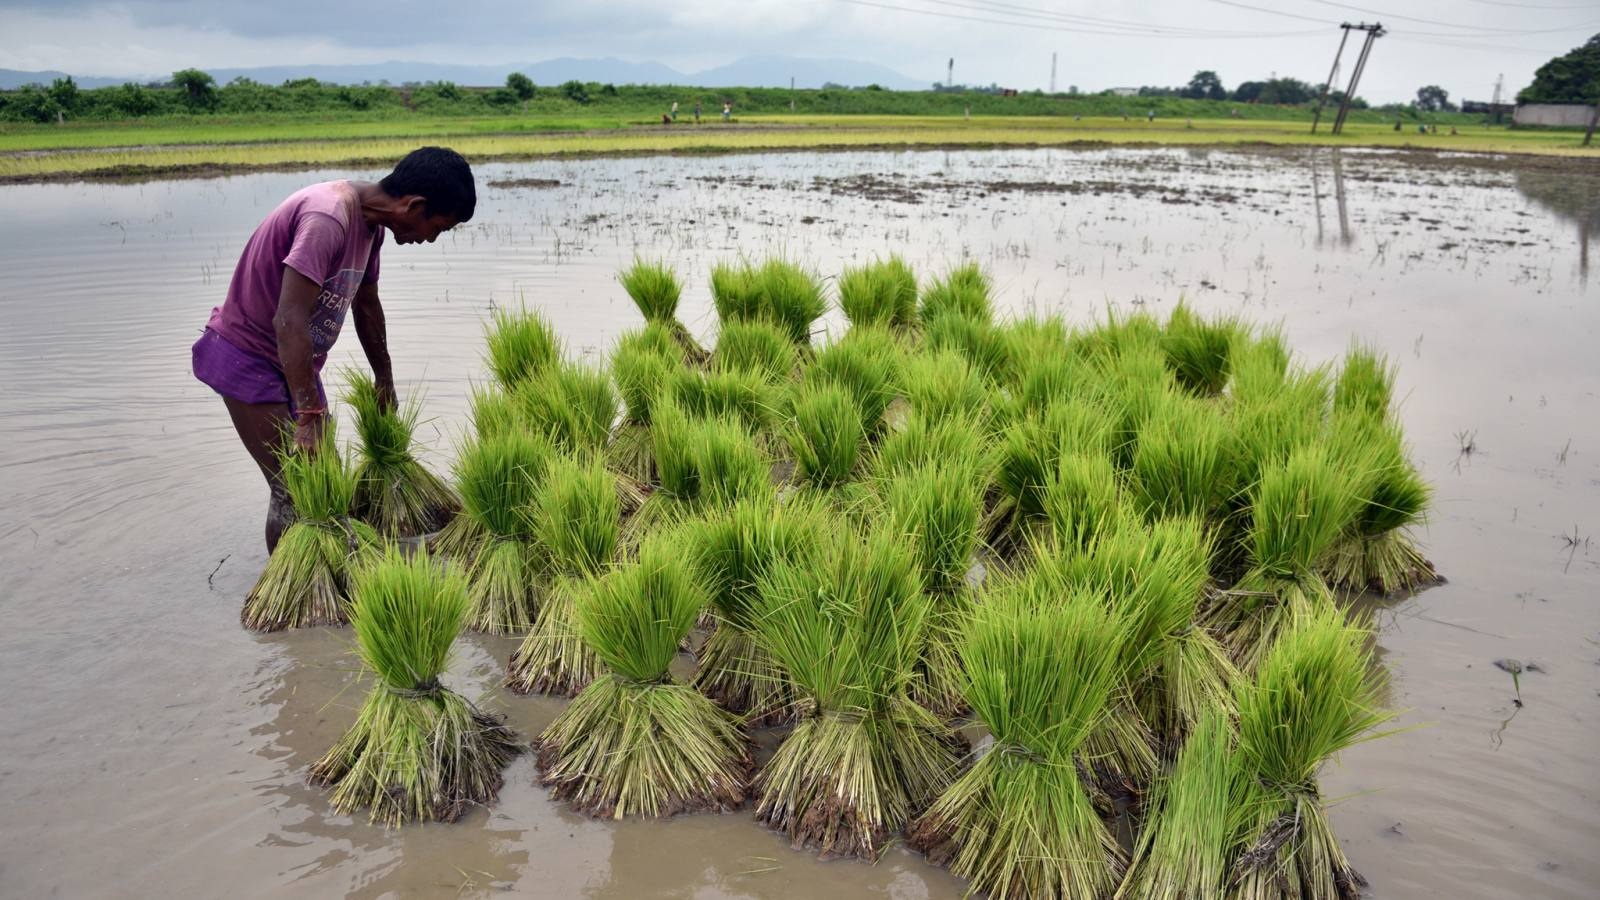 A farmer in India